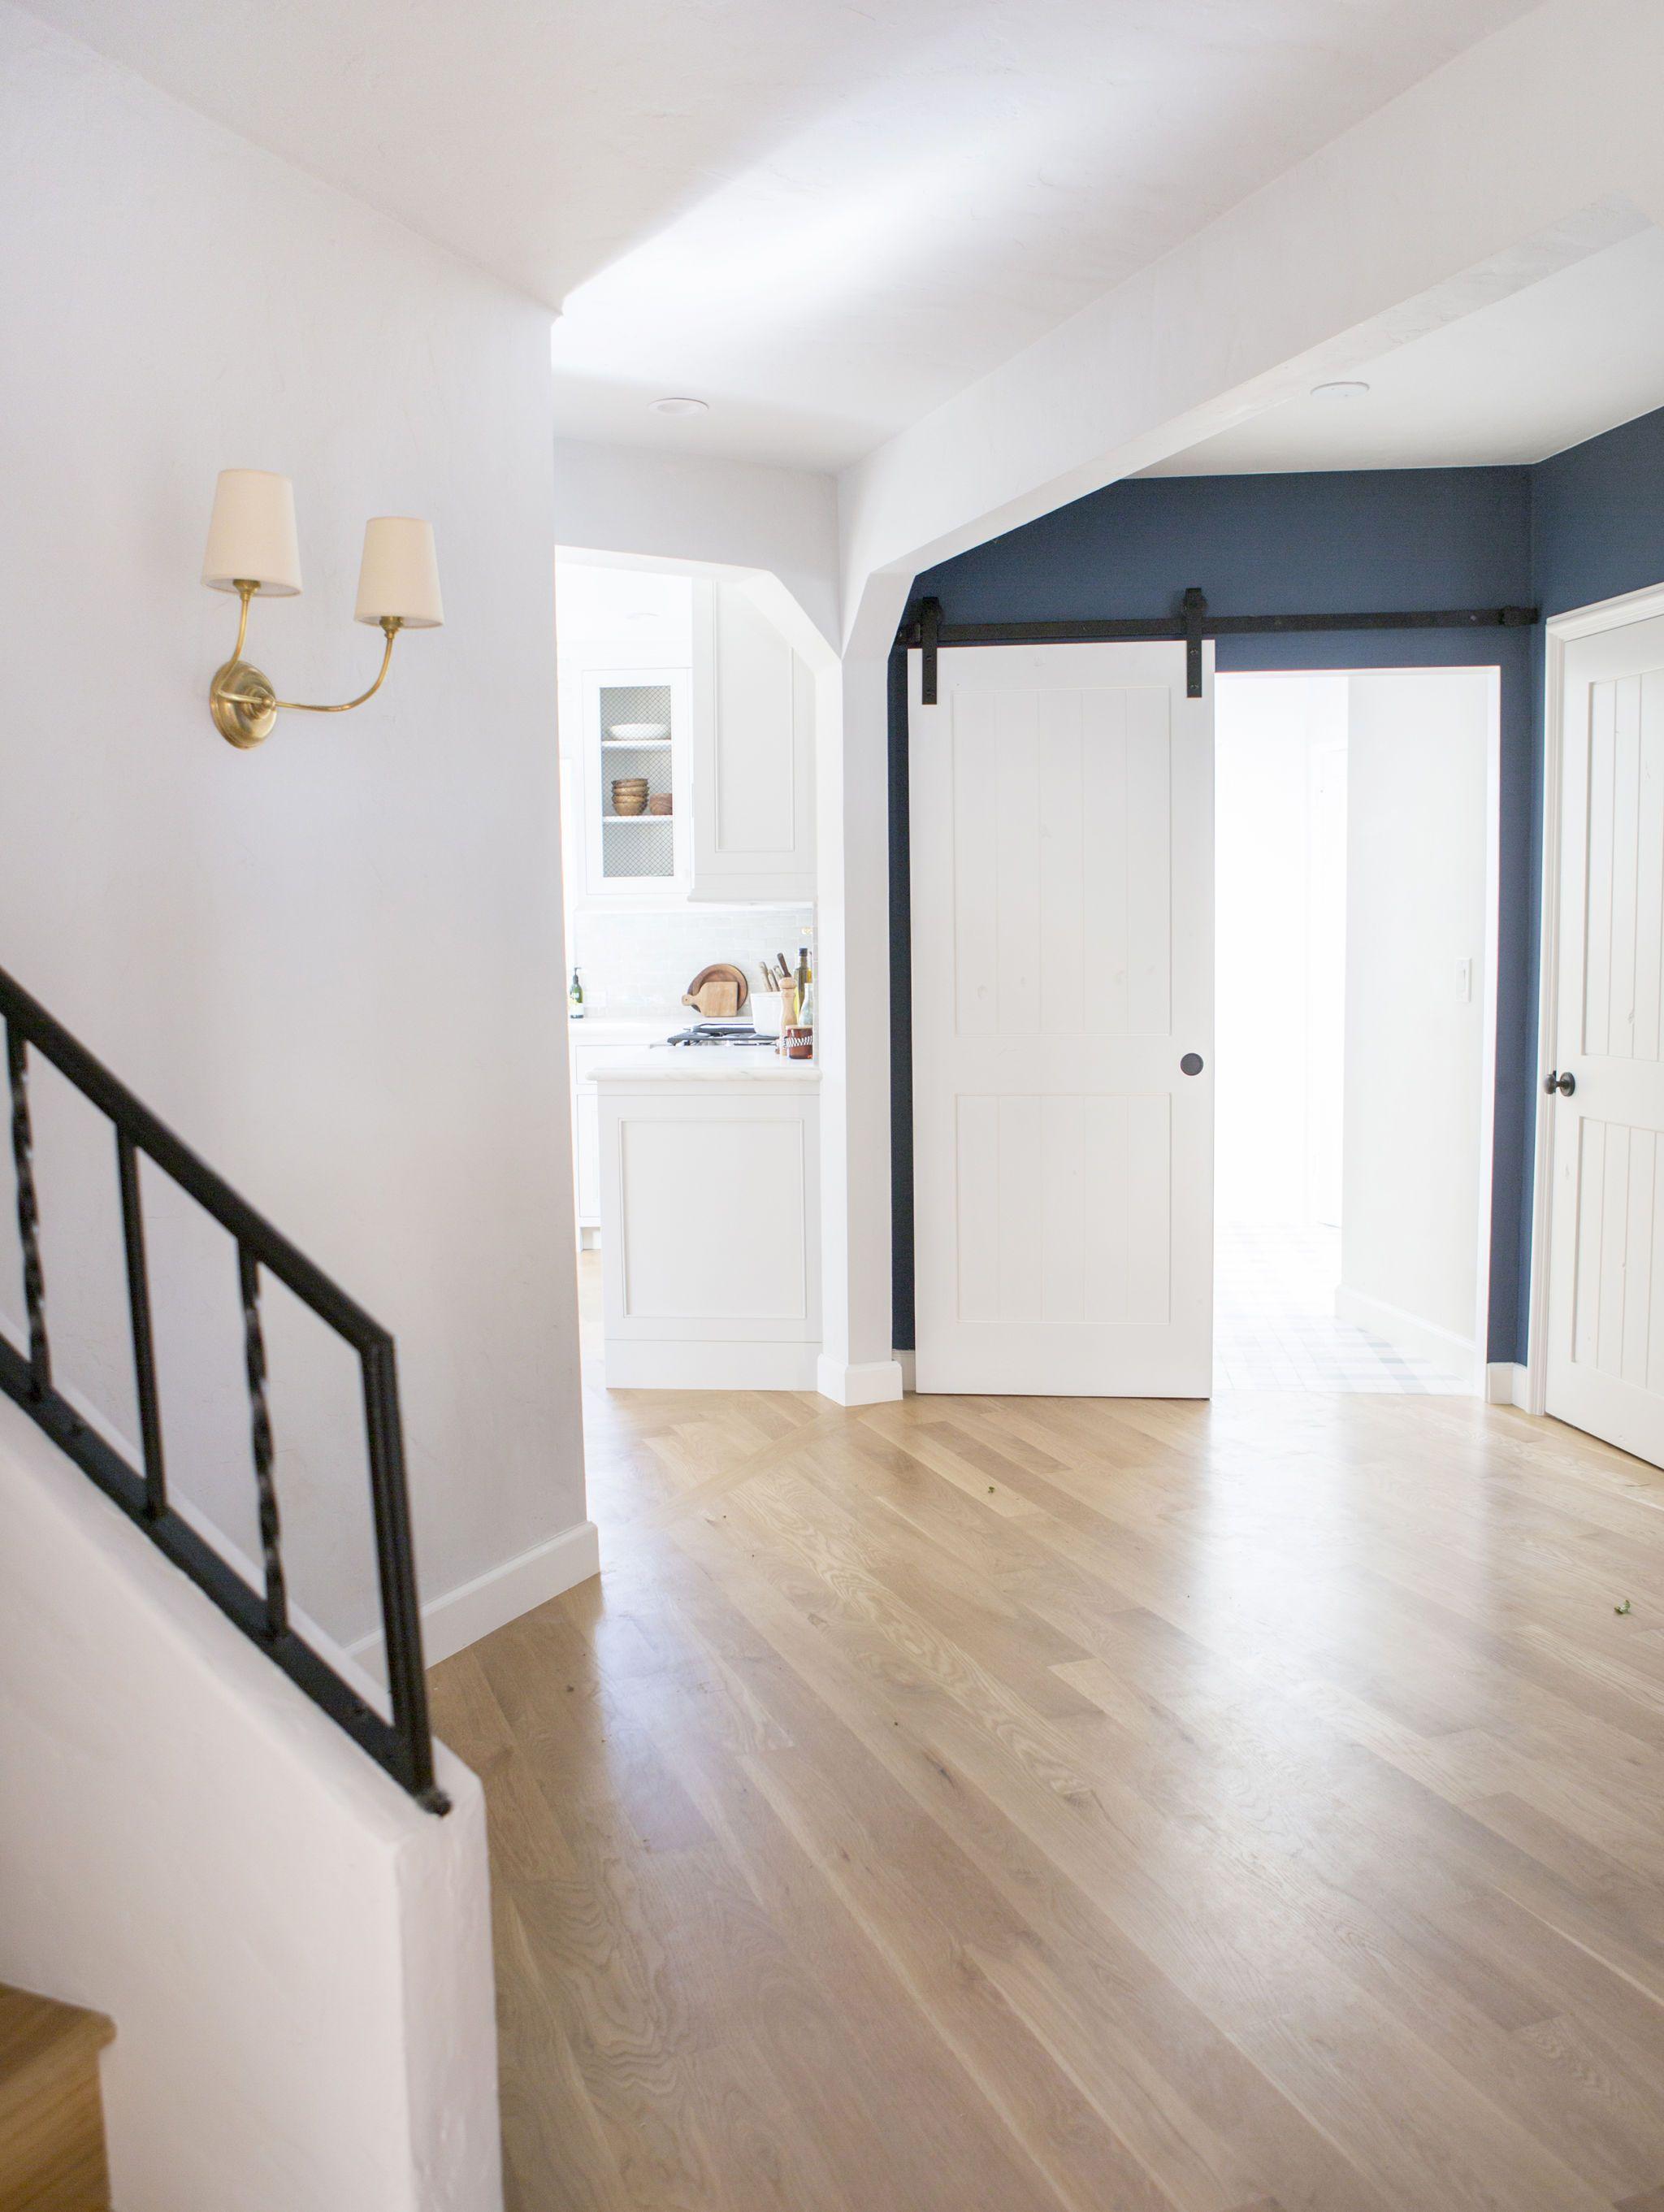 The Story of Our Herringbone Flooring | Natural oak ...